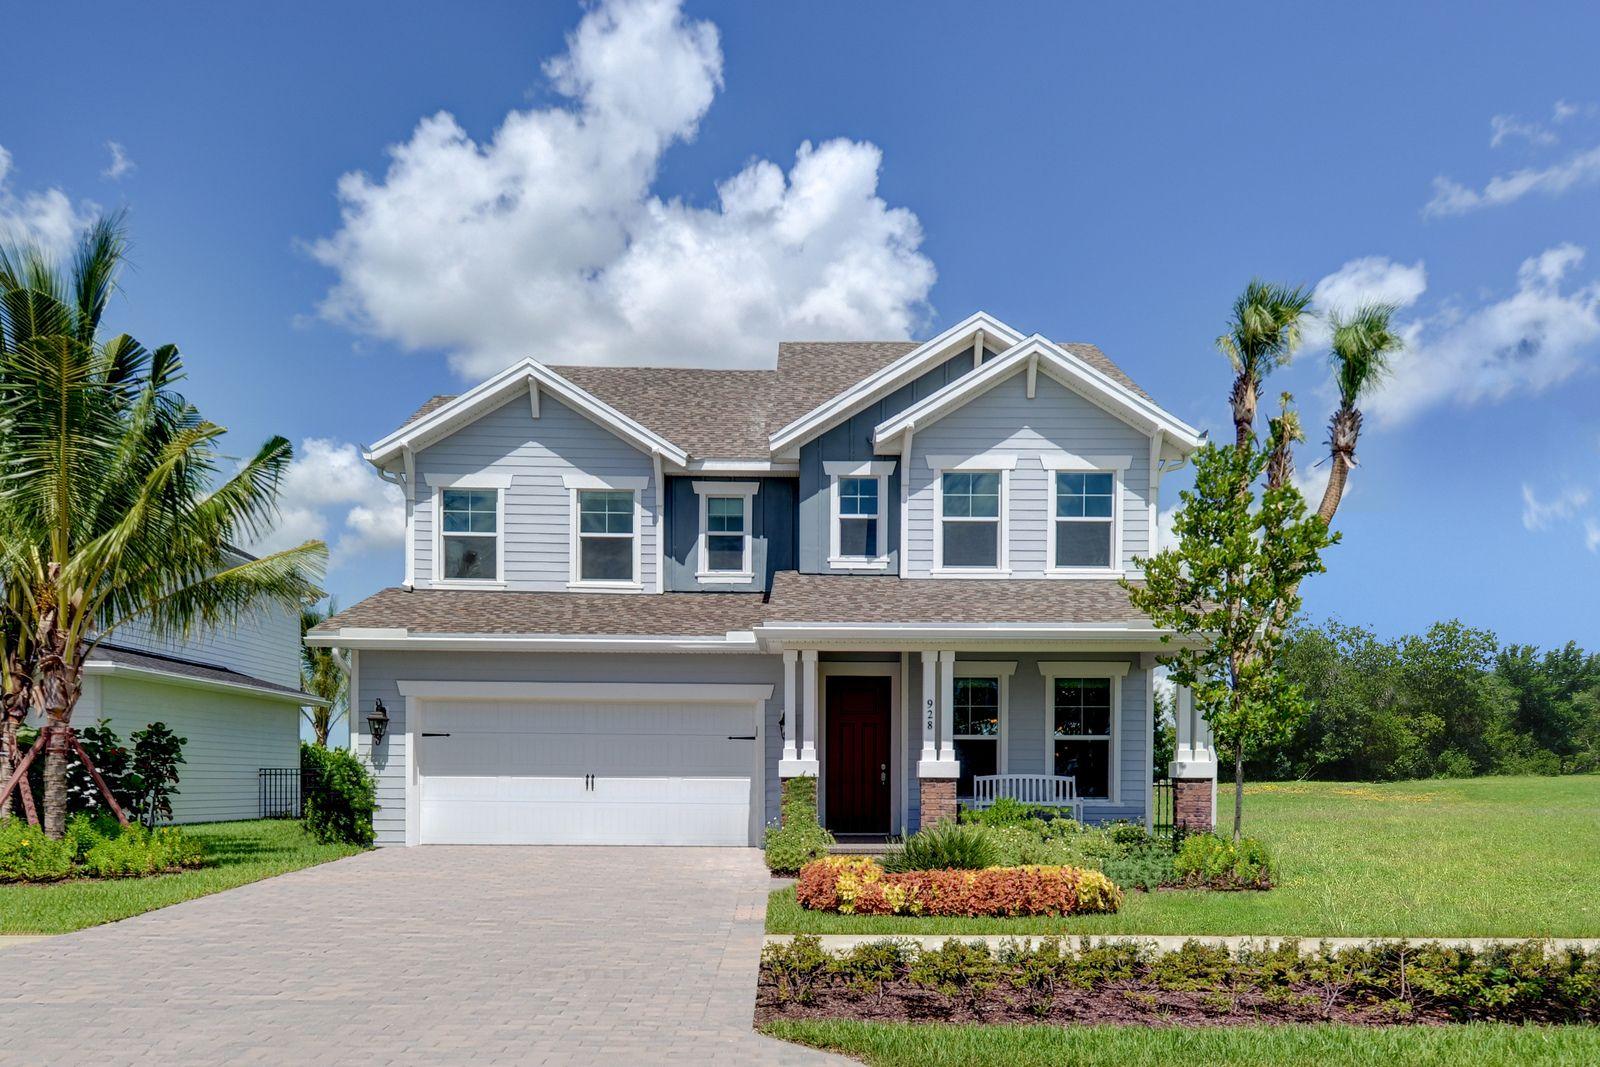 Single Family for Sale at Rosalind 913 Serling Pine Pl Wellington, Florida 33470 United States